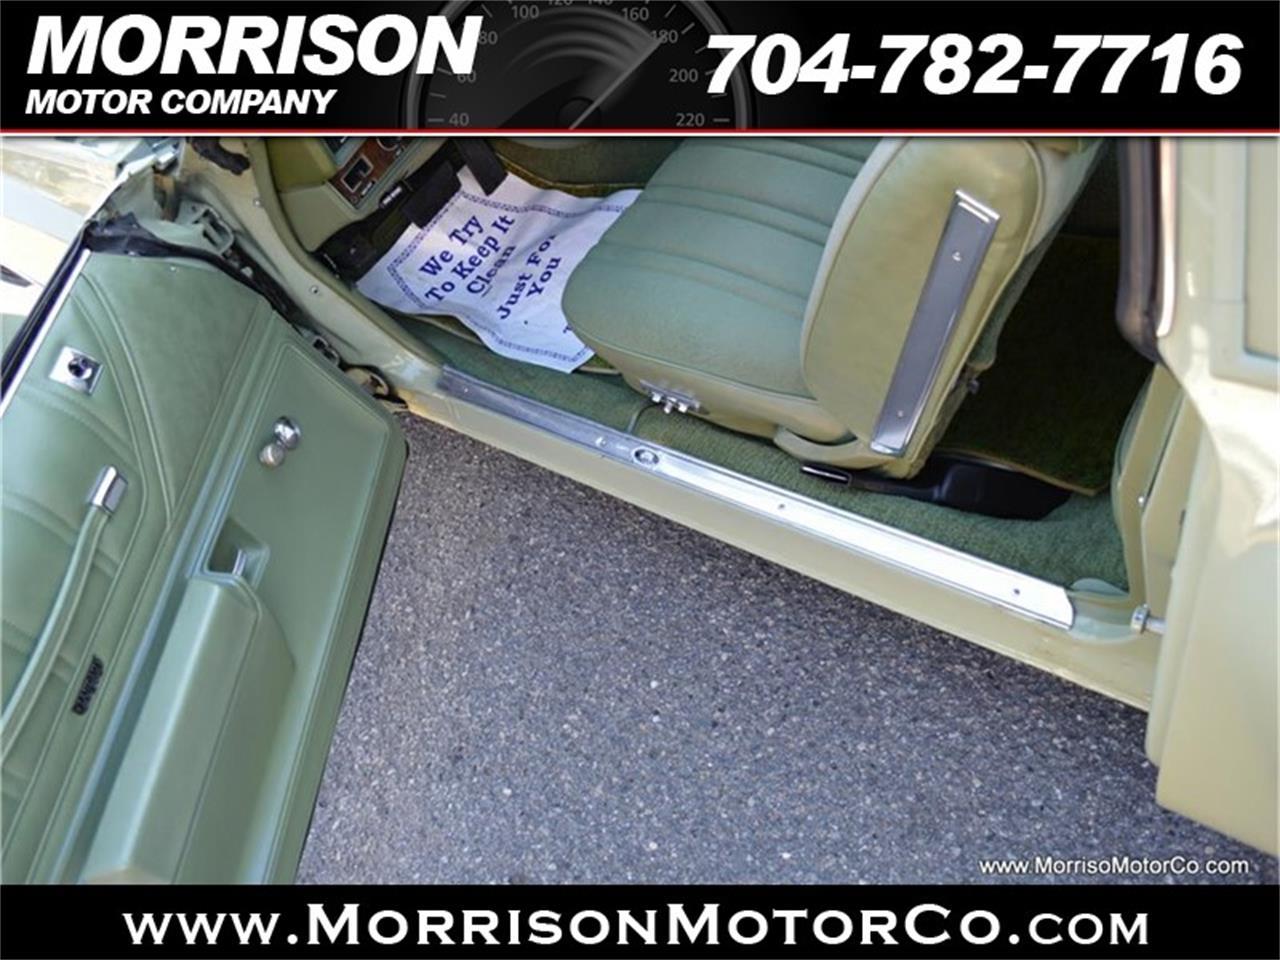 Large Picture of '74 Monte Carlo located in Concord North Carolina - $19,900.00 - PEZN